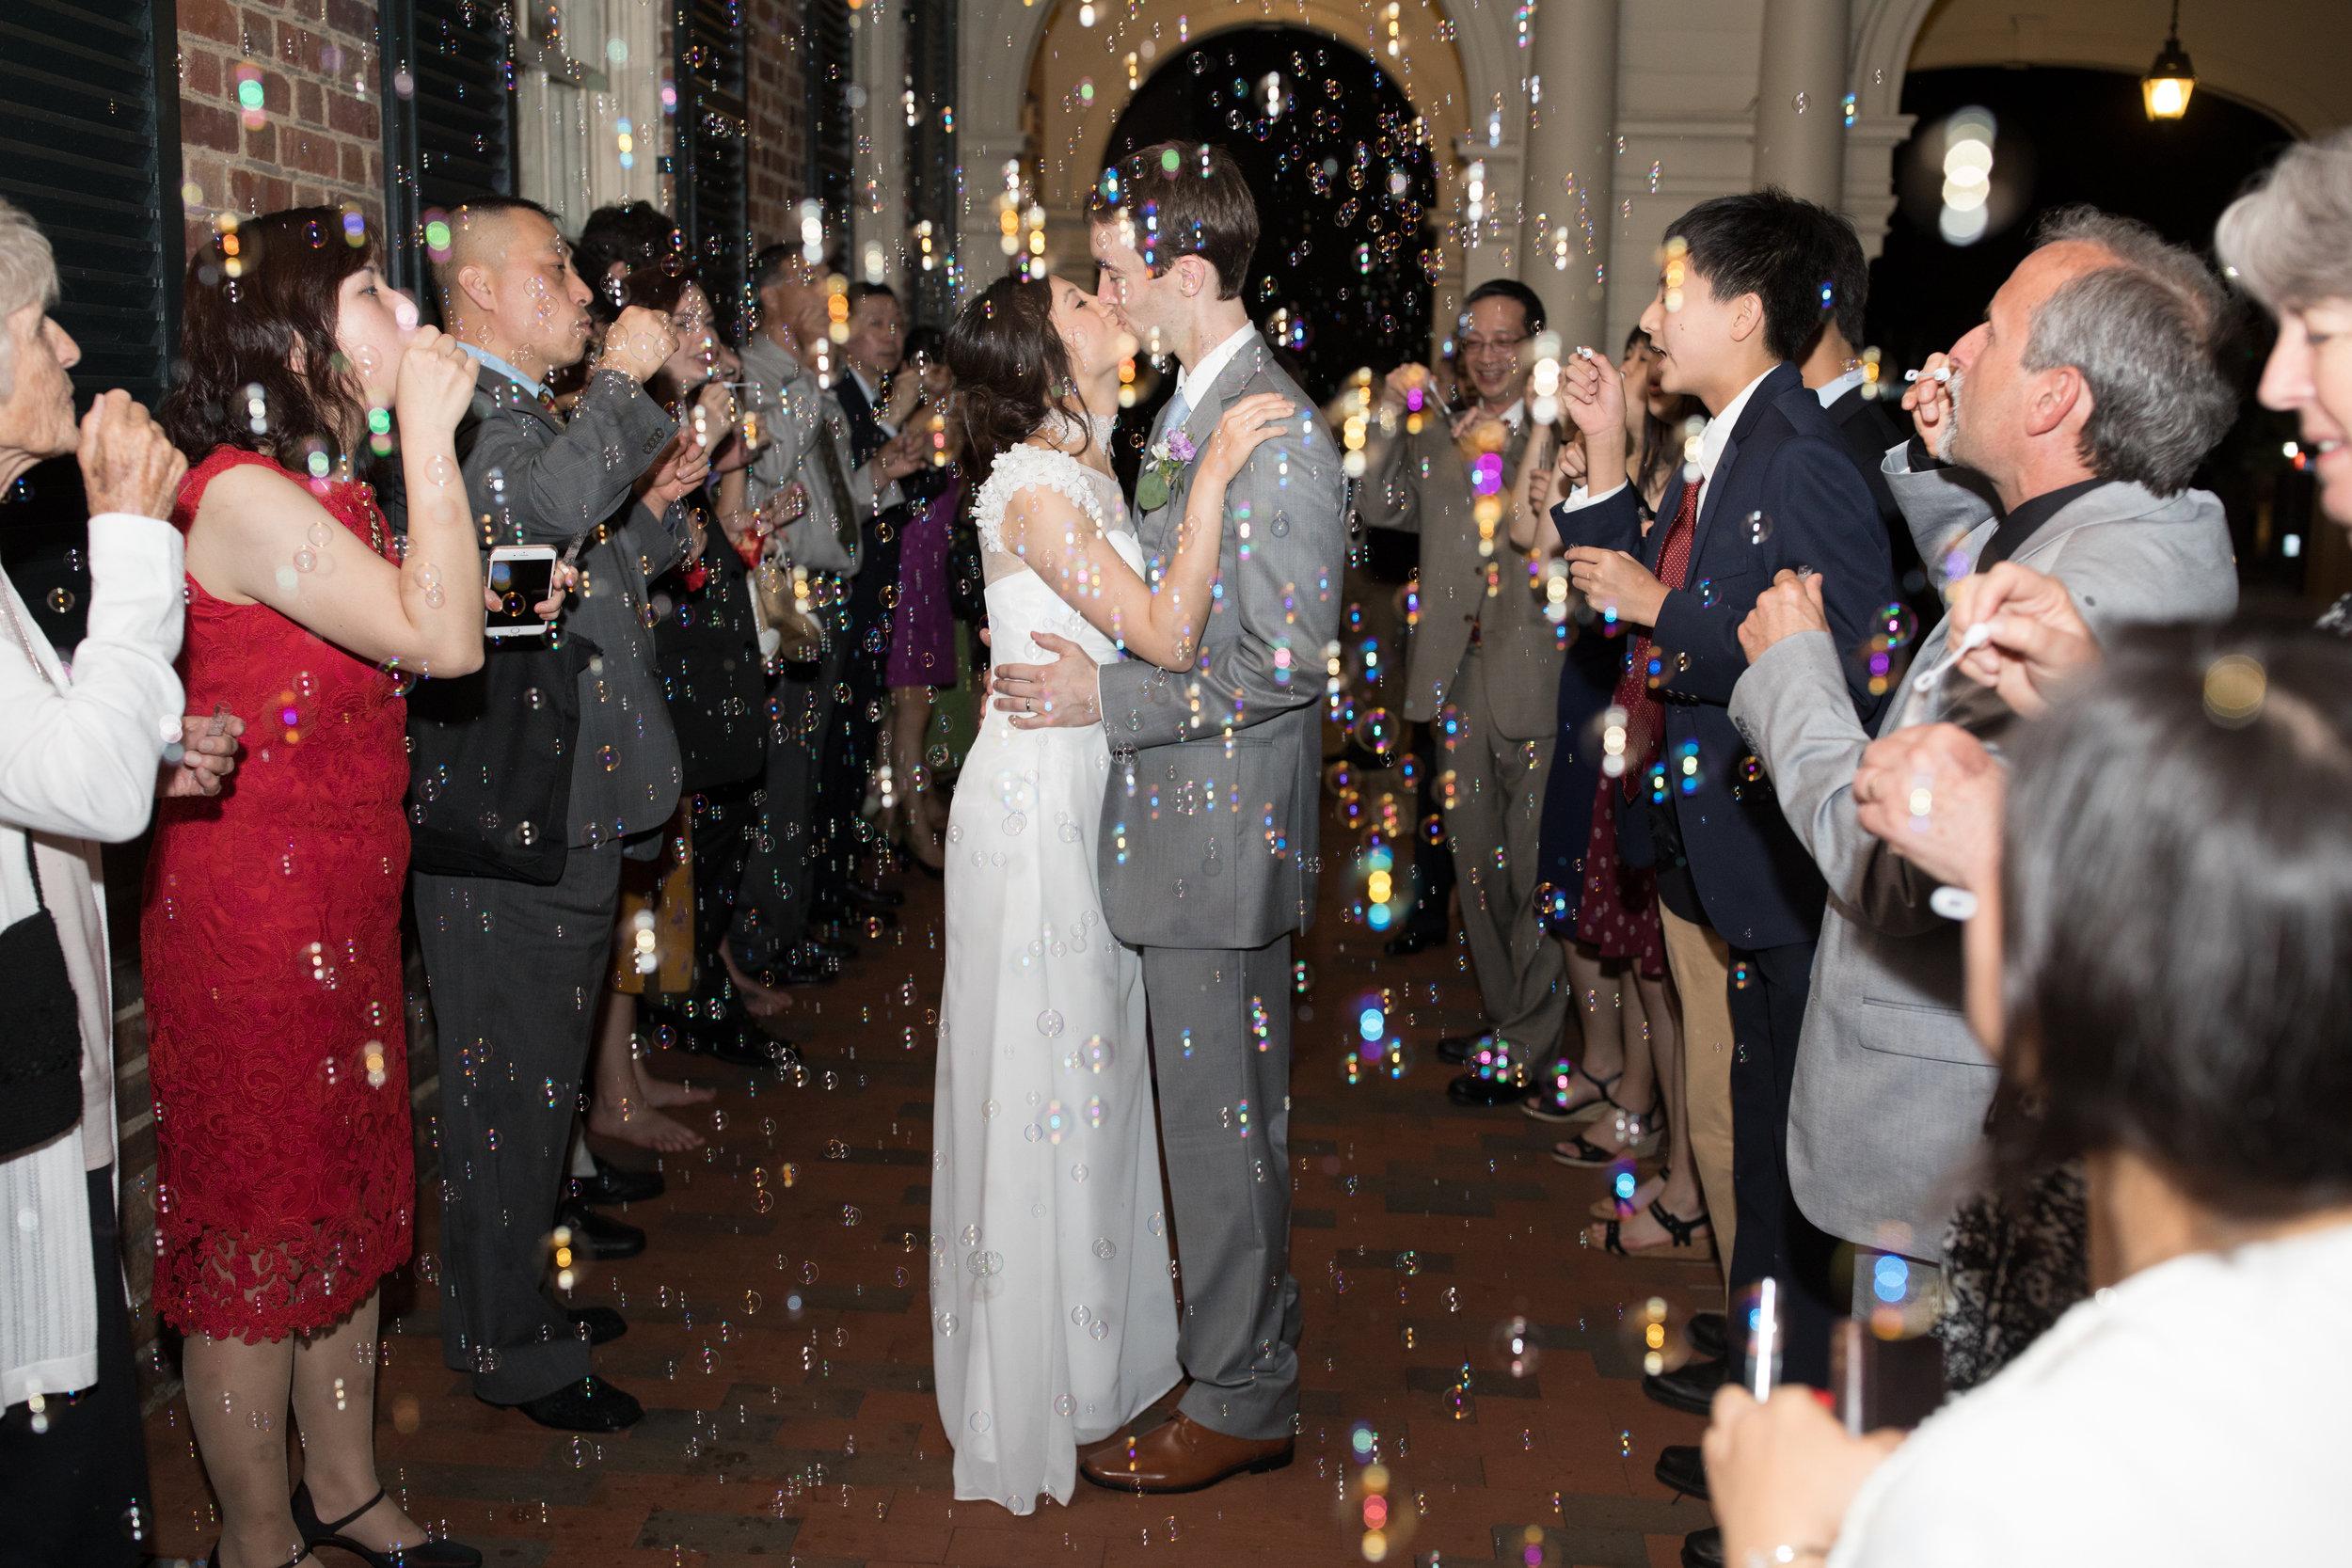 2017_04_30_jenny_jonathans_wedding_reception-431.jpg